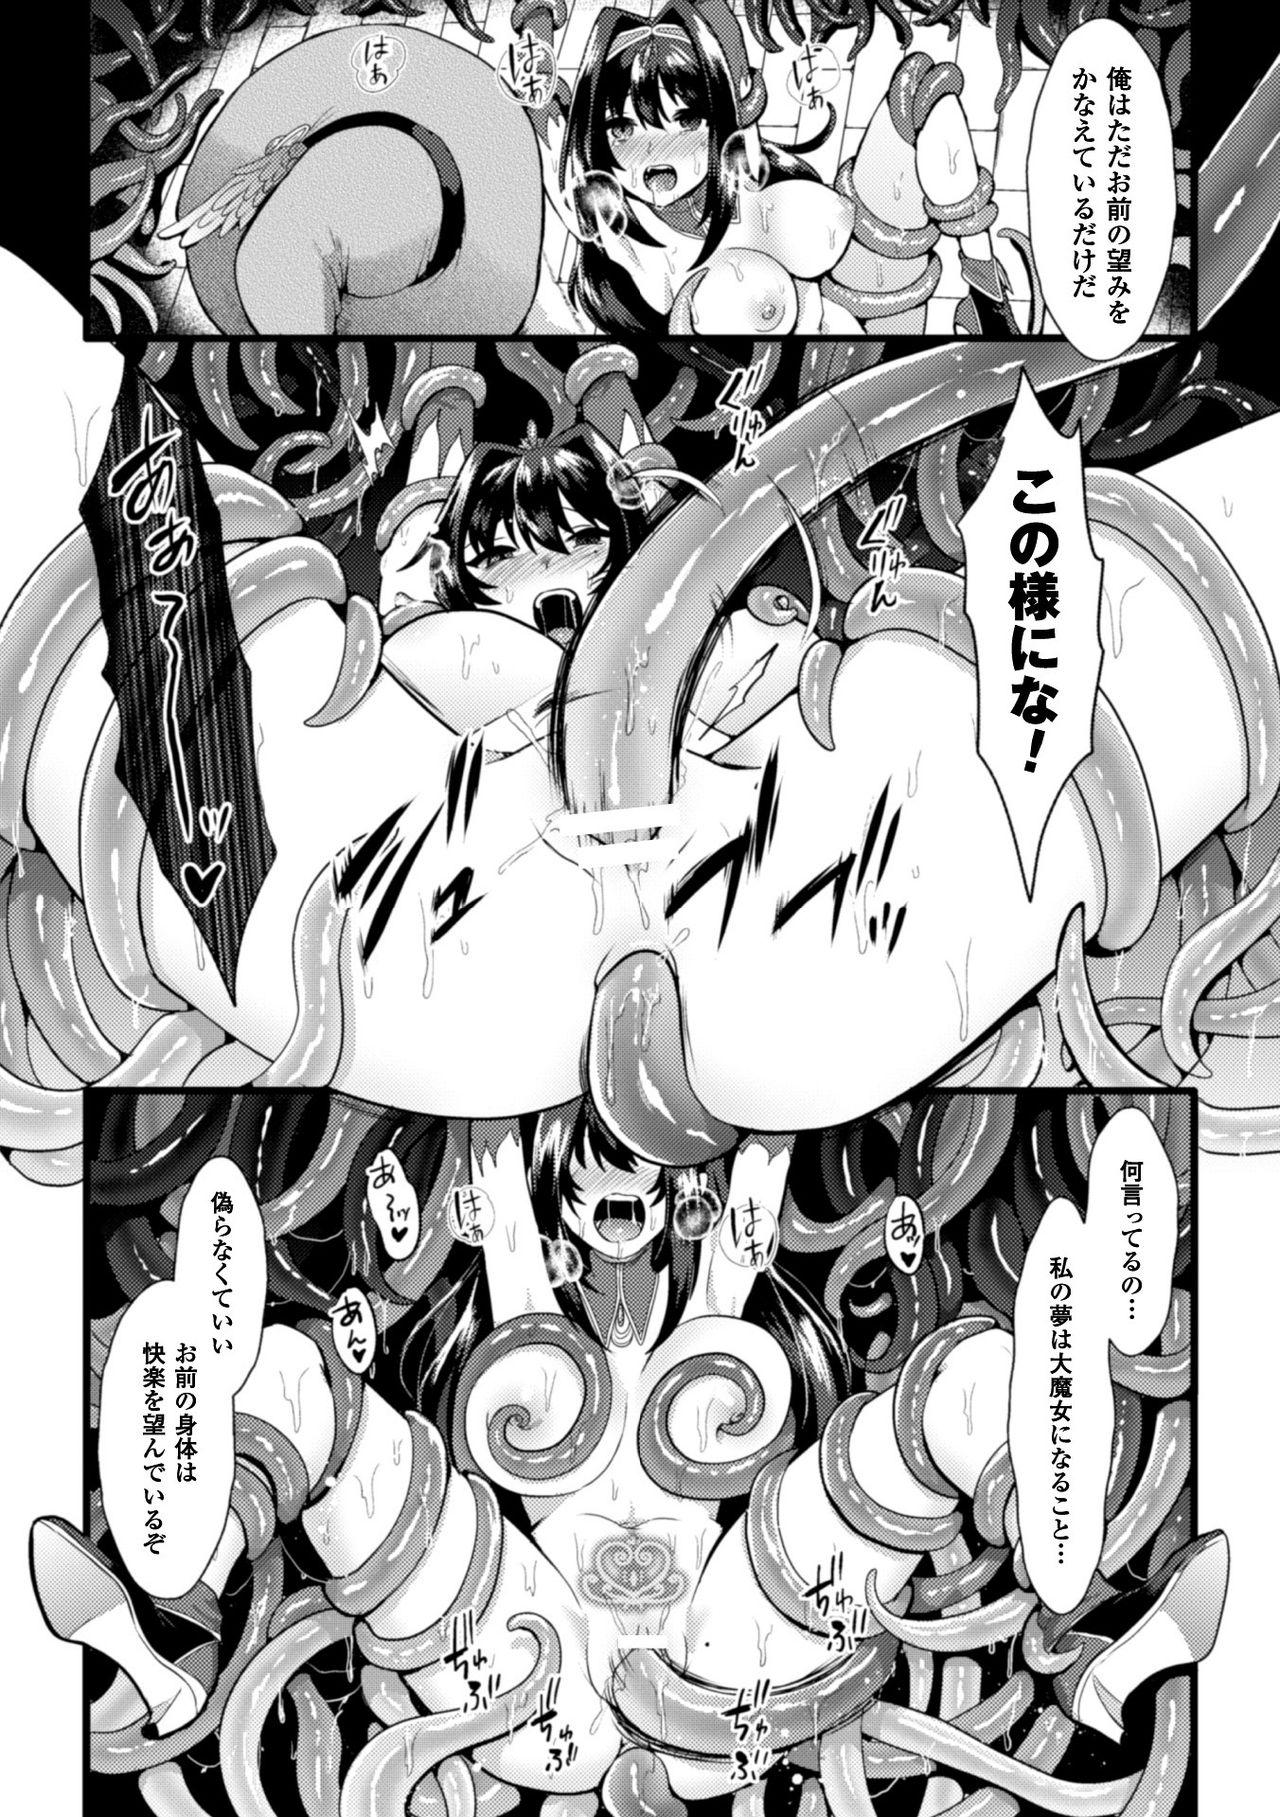 2D Comic Magazine TS Jibun Heroine mou Hitori no Ore ga Erosugite Gaman Dekinee! Vol. 1 37